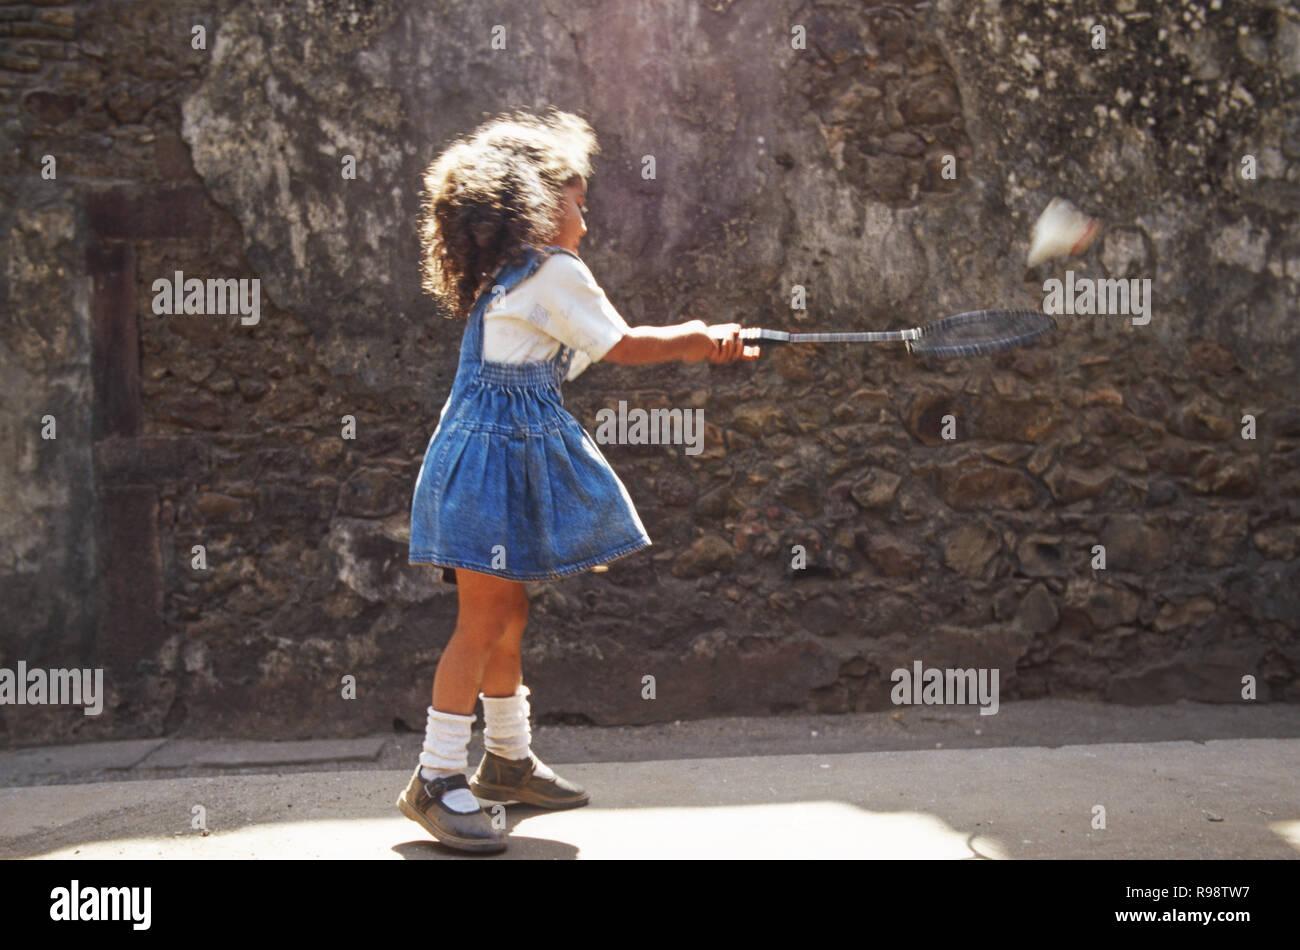 Young Girl playing Badminton Photo Stock